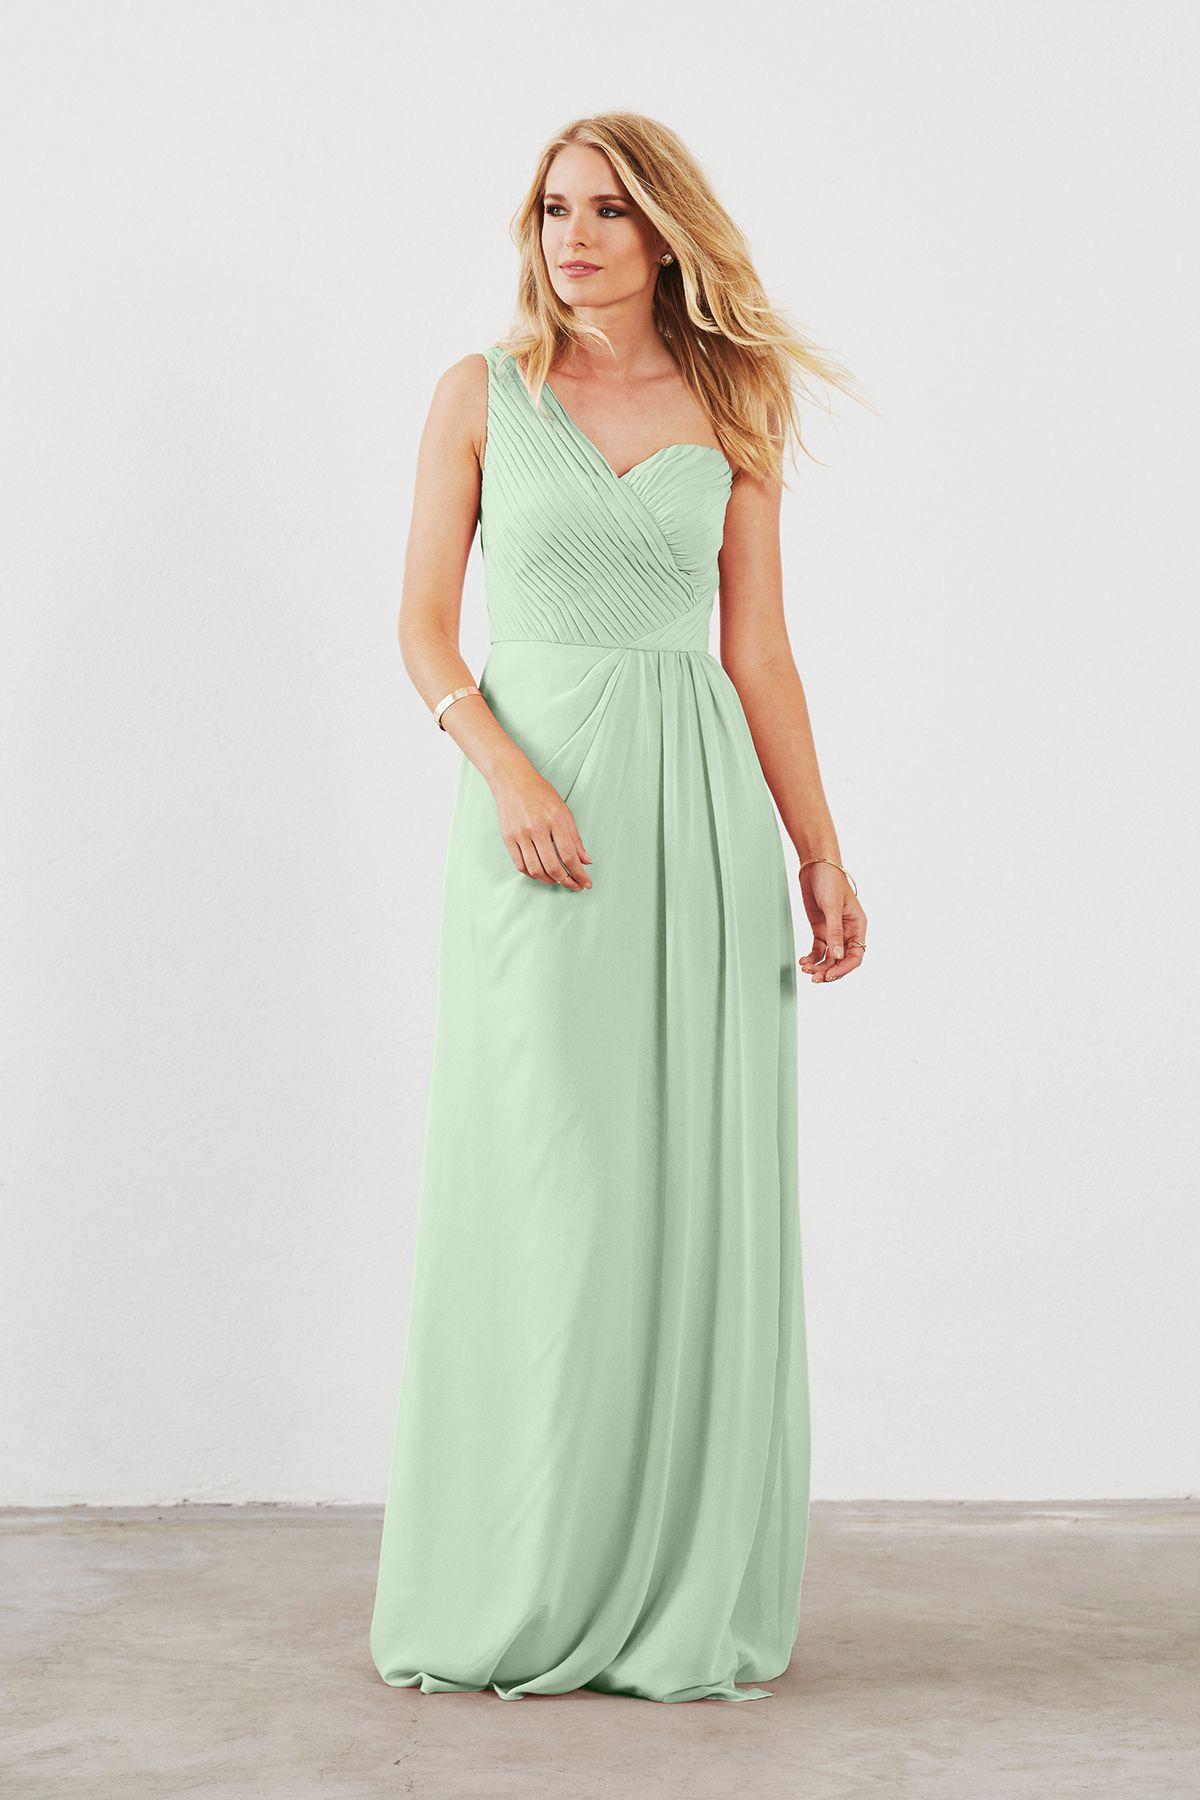 Dove & Dahlia Louisa Bridesmaid Dress in Sage Green in Chiffon ...